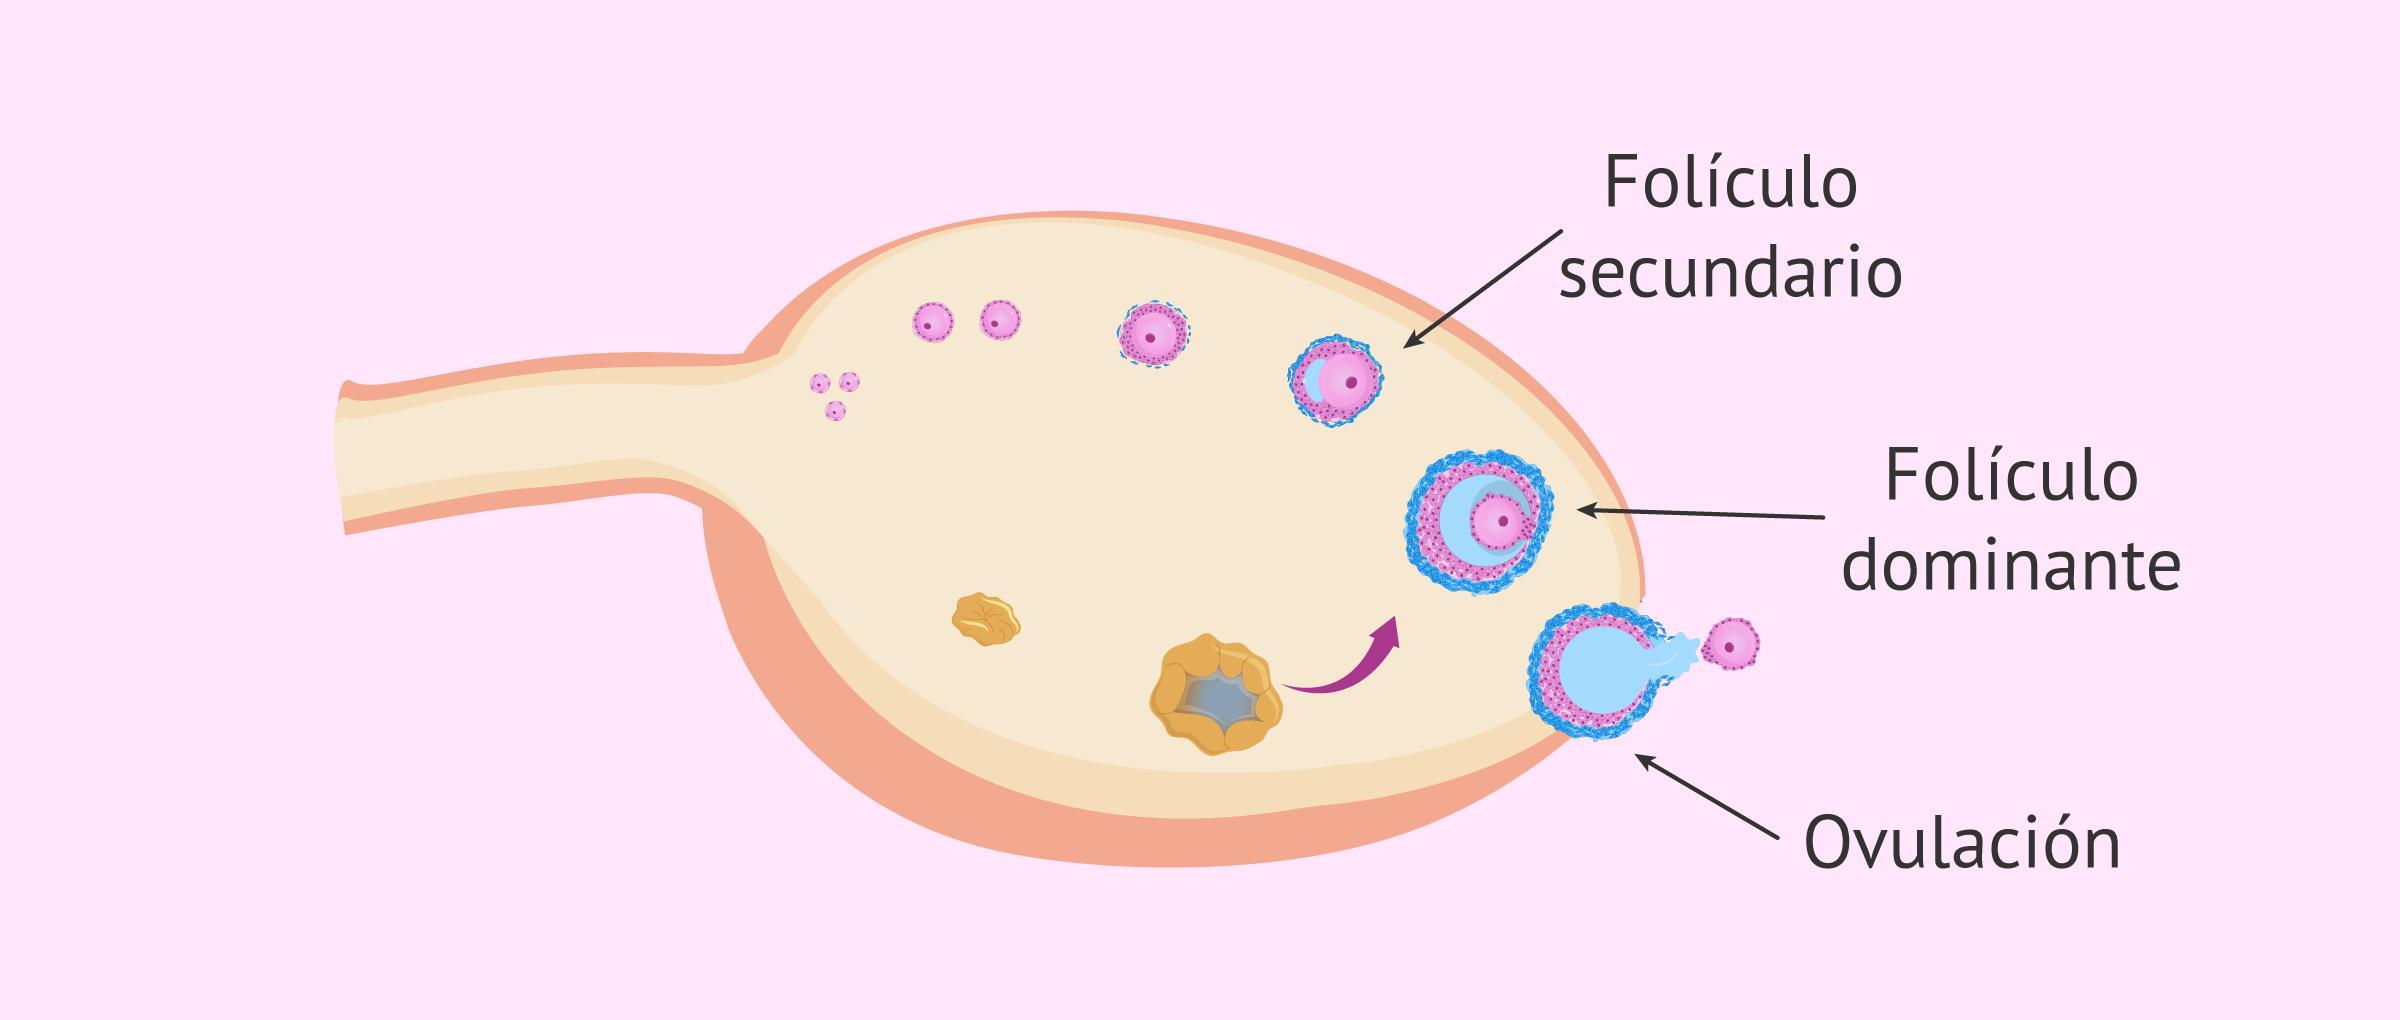 foliculo-dominante